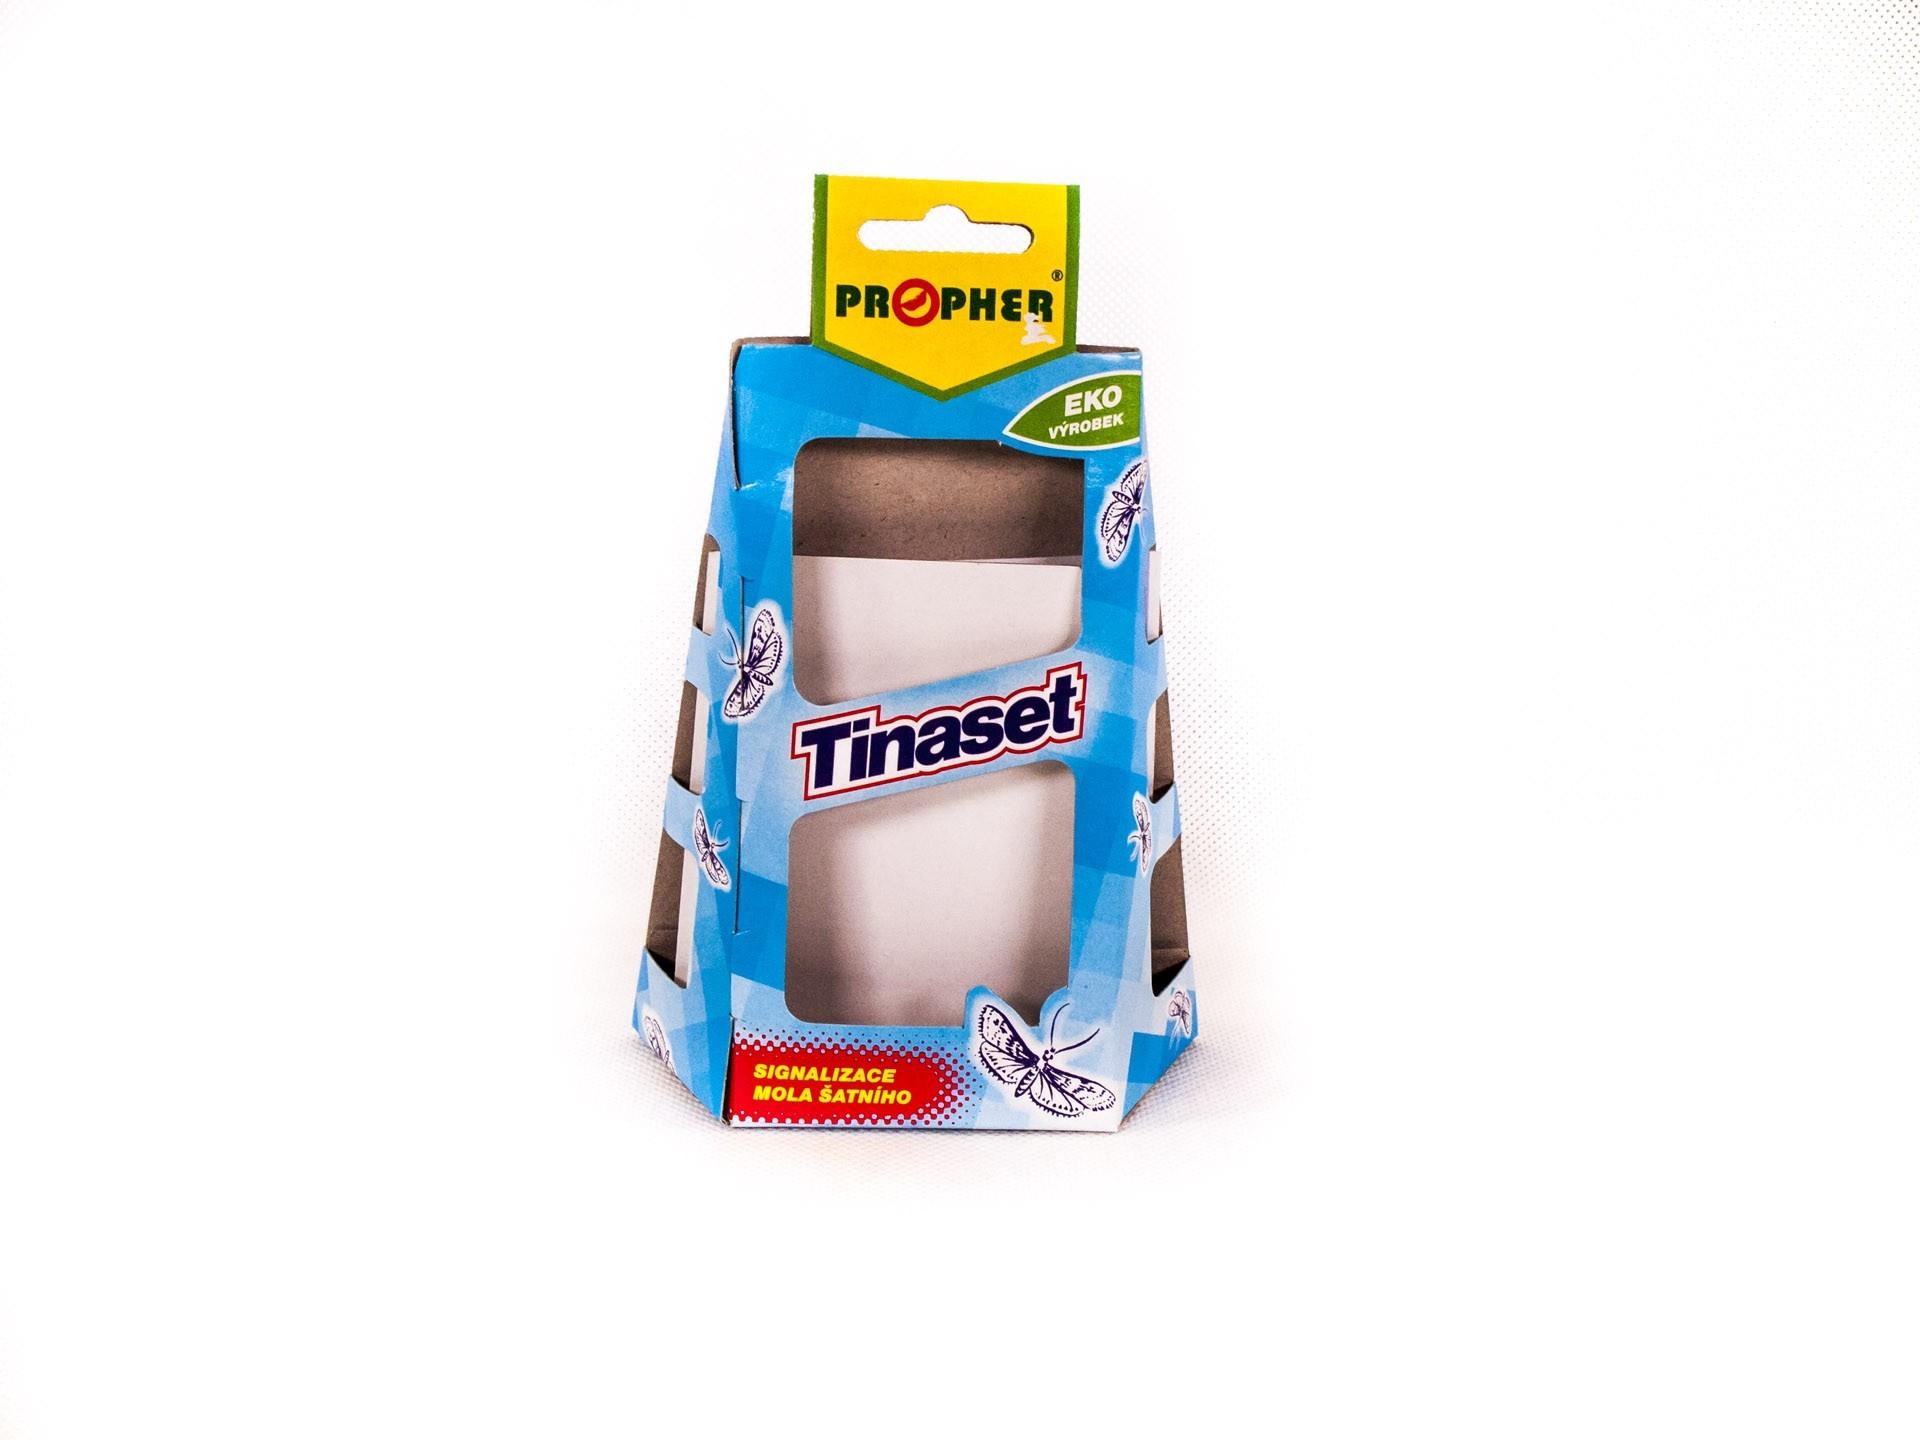 Tinaset trap for clothes moths